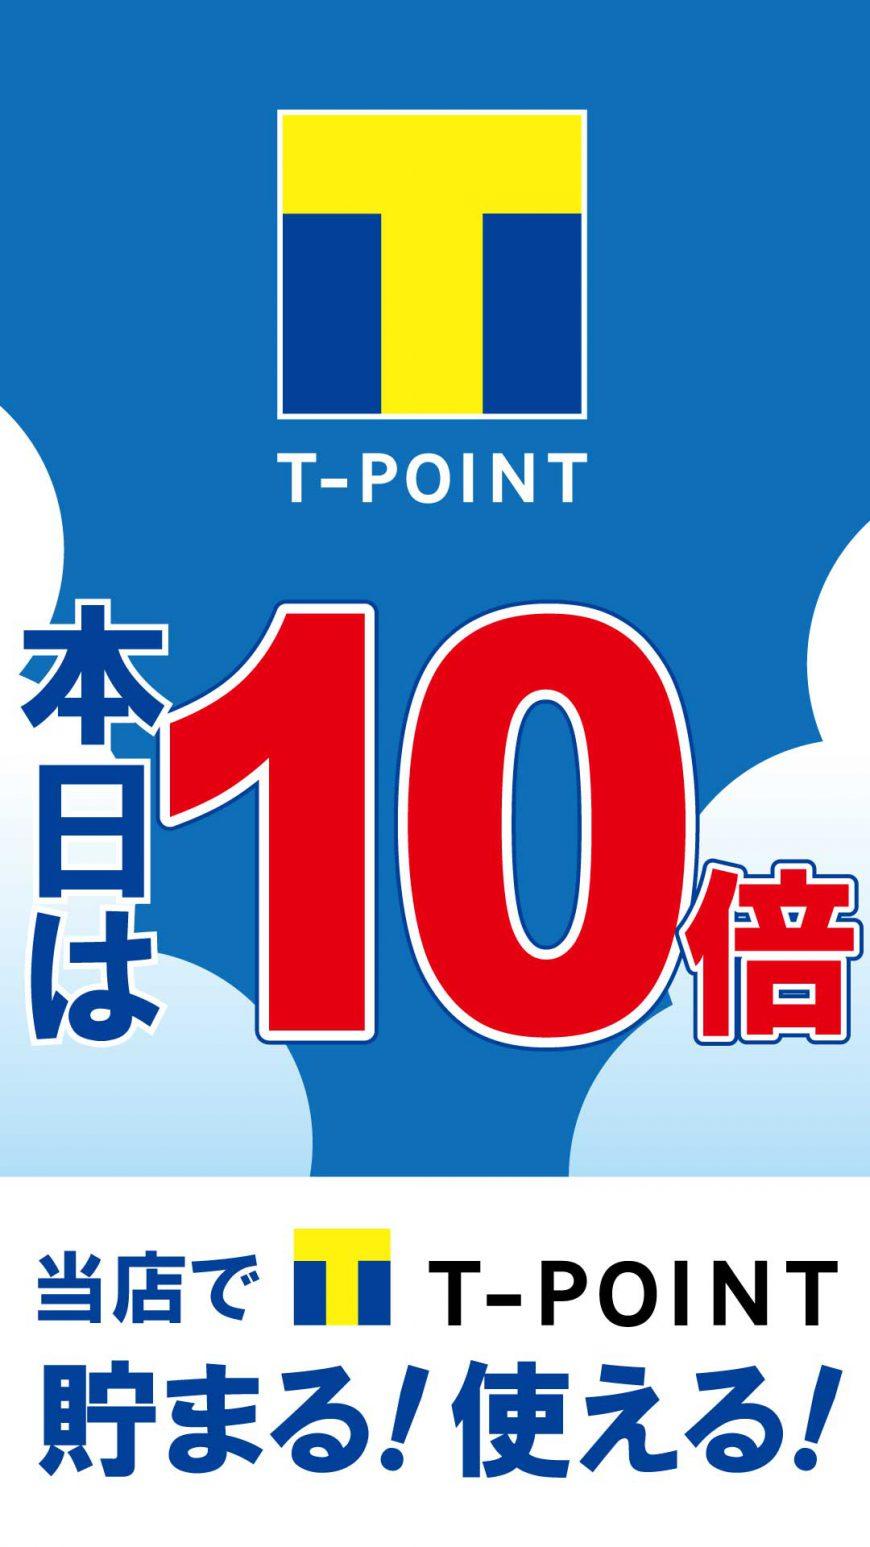 Tポイント10倍デー 8月31日(土)9月1日(日)